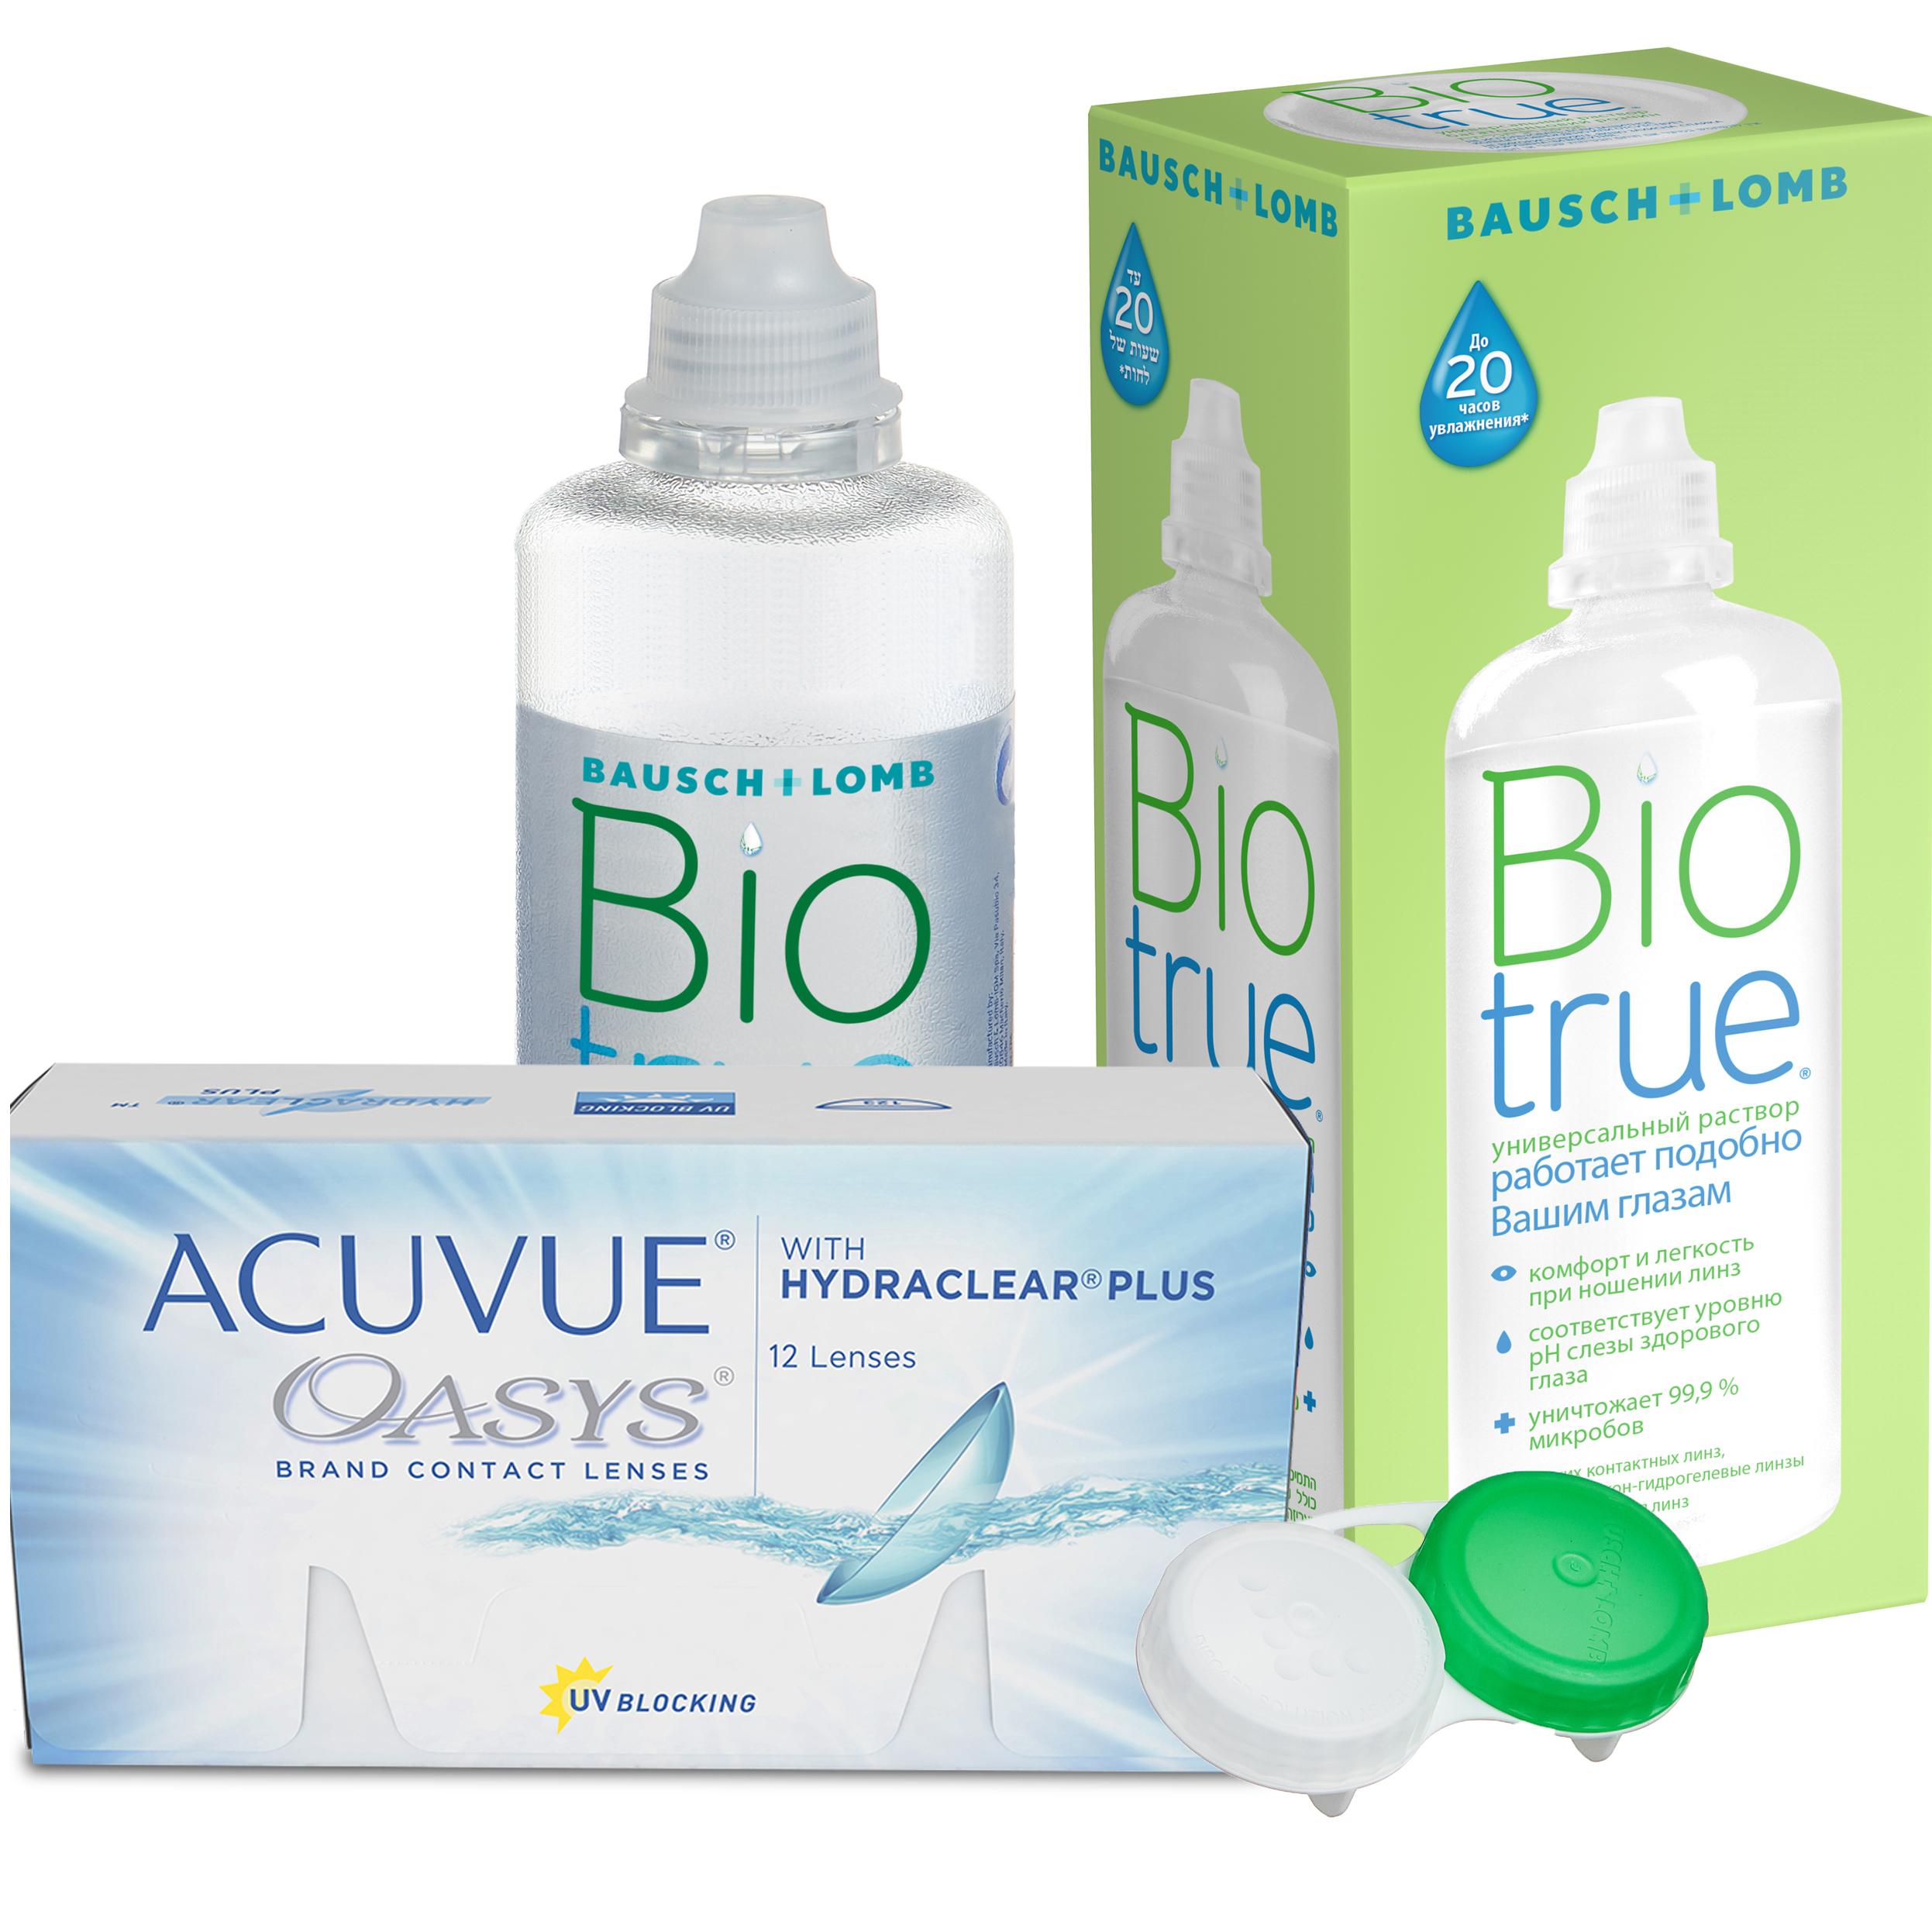 Купить Oasys with Hydraclear Plus 12 линз + Biotrue, Контактные линзы Acuvue Oasys with Hydraclear Plus 12 линз R 8.8 -2, 75 + Biotrue 300 мл